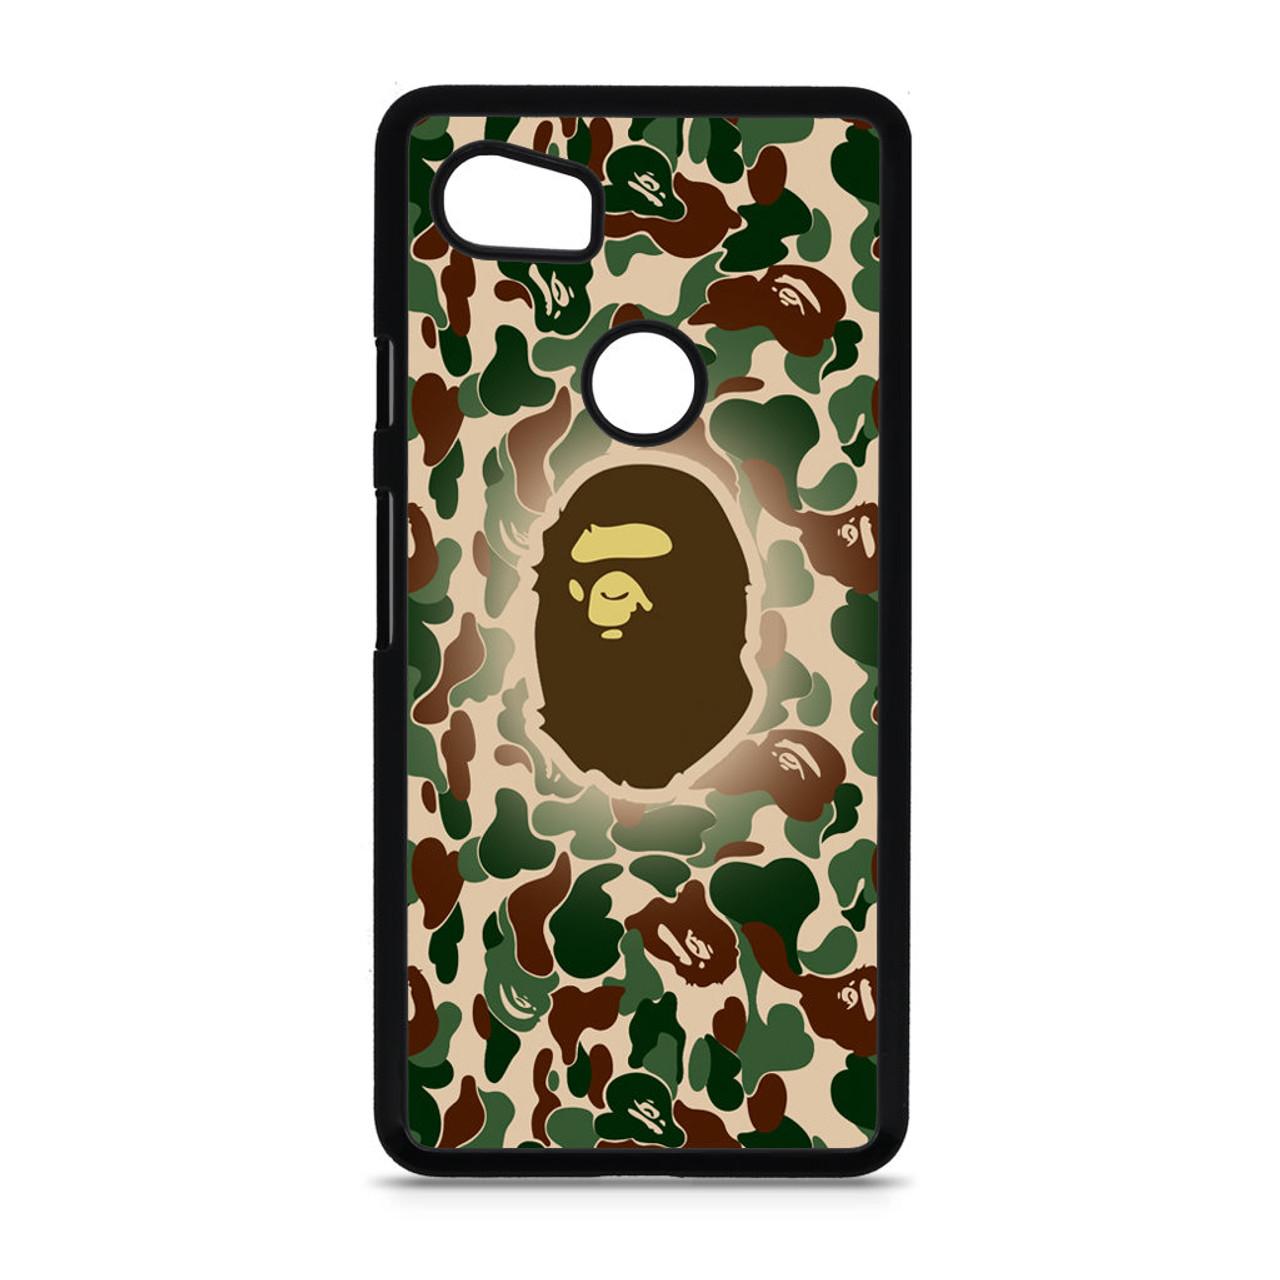 new product 3eb96 d5885 Bathing Ape Bape Camo Google Pixel 2 XL Case